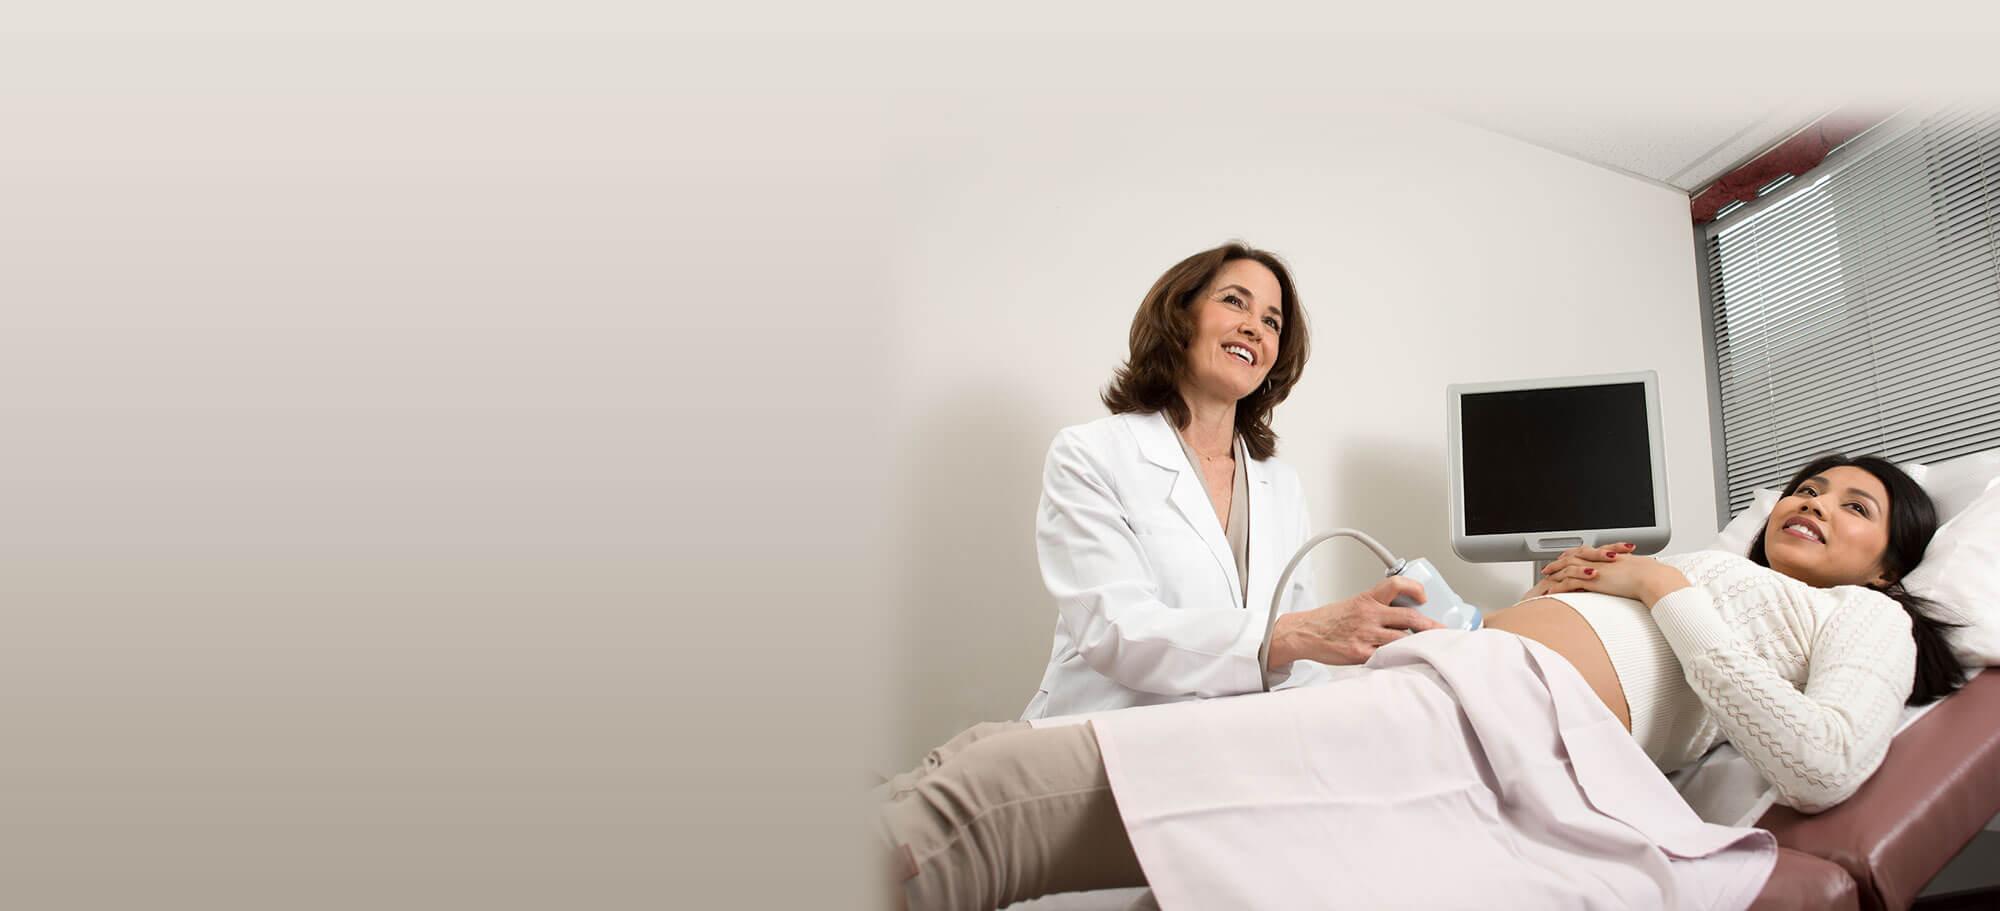 Doctor Karla Iacampo Capturing a Sonogram with Patient